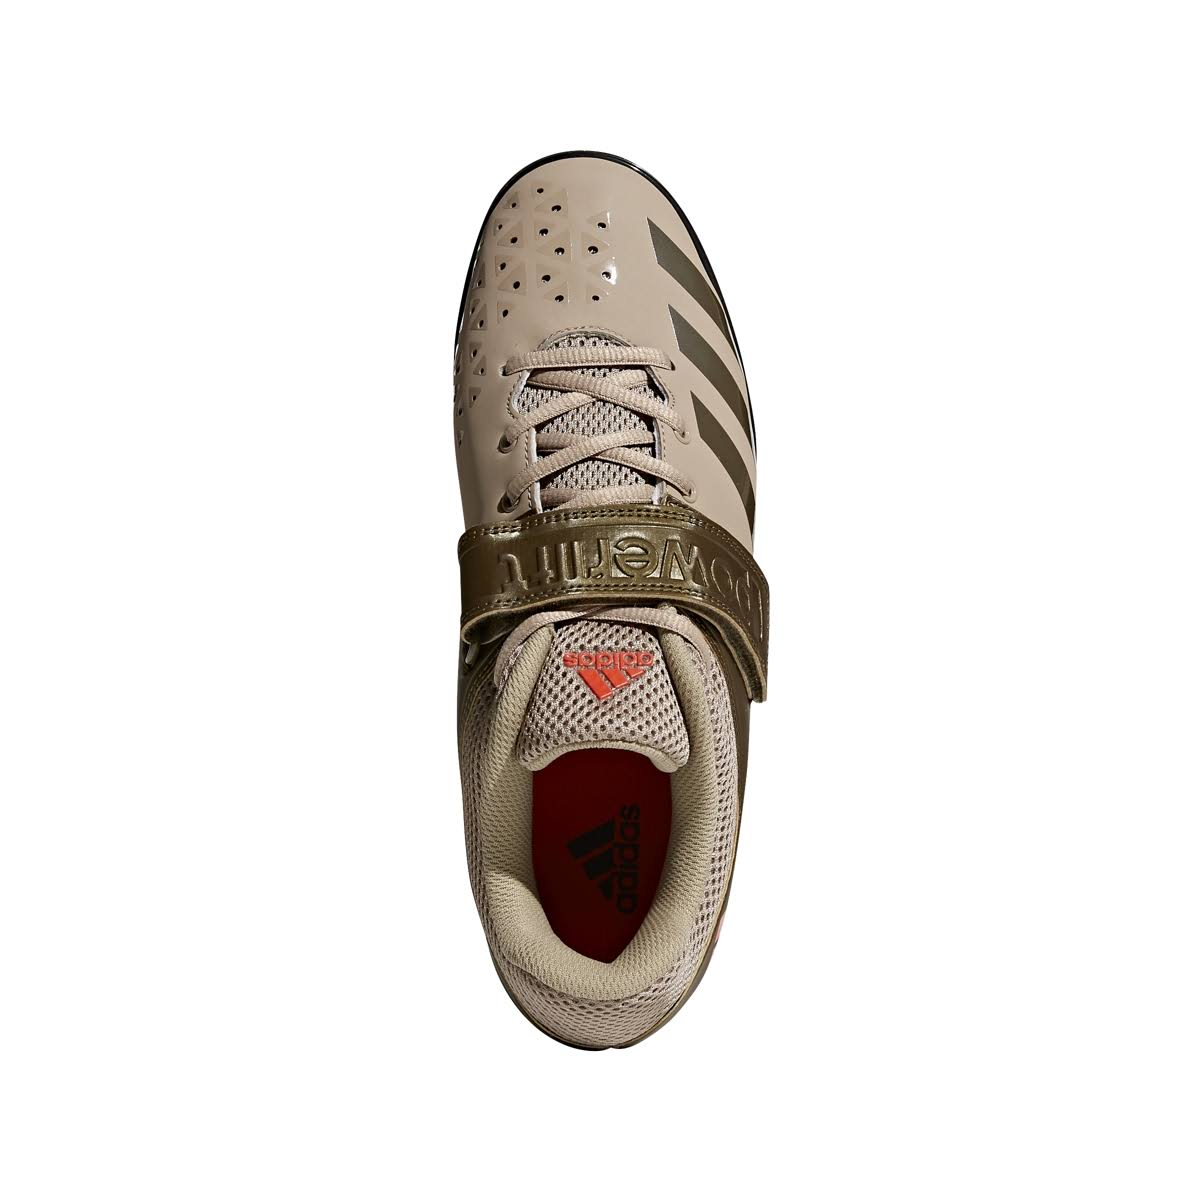 Tamaño Ba8017 1 Adidas 5 Para Hombre Powerlift Zapatos 5 3 wC0RqB